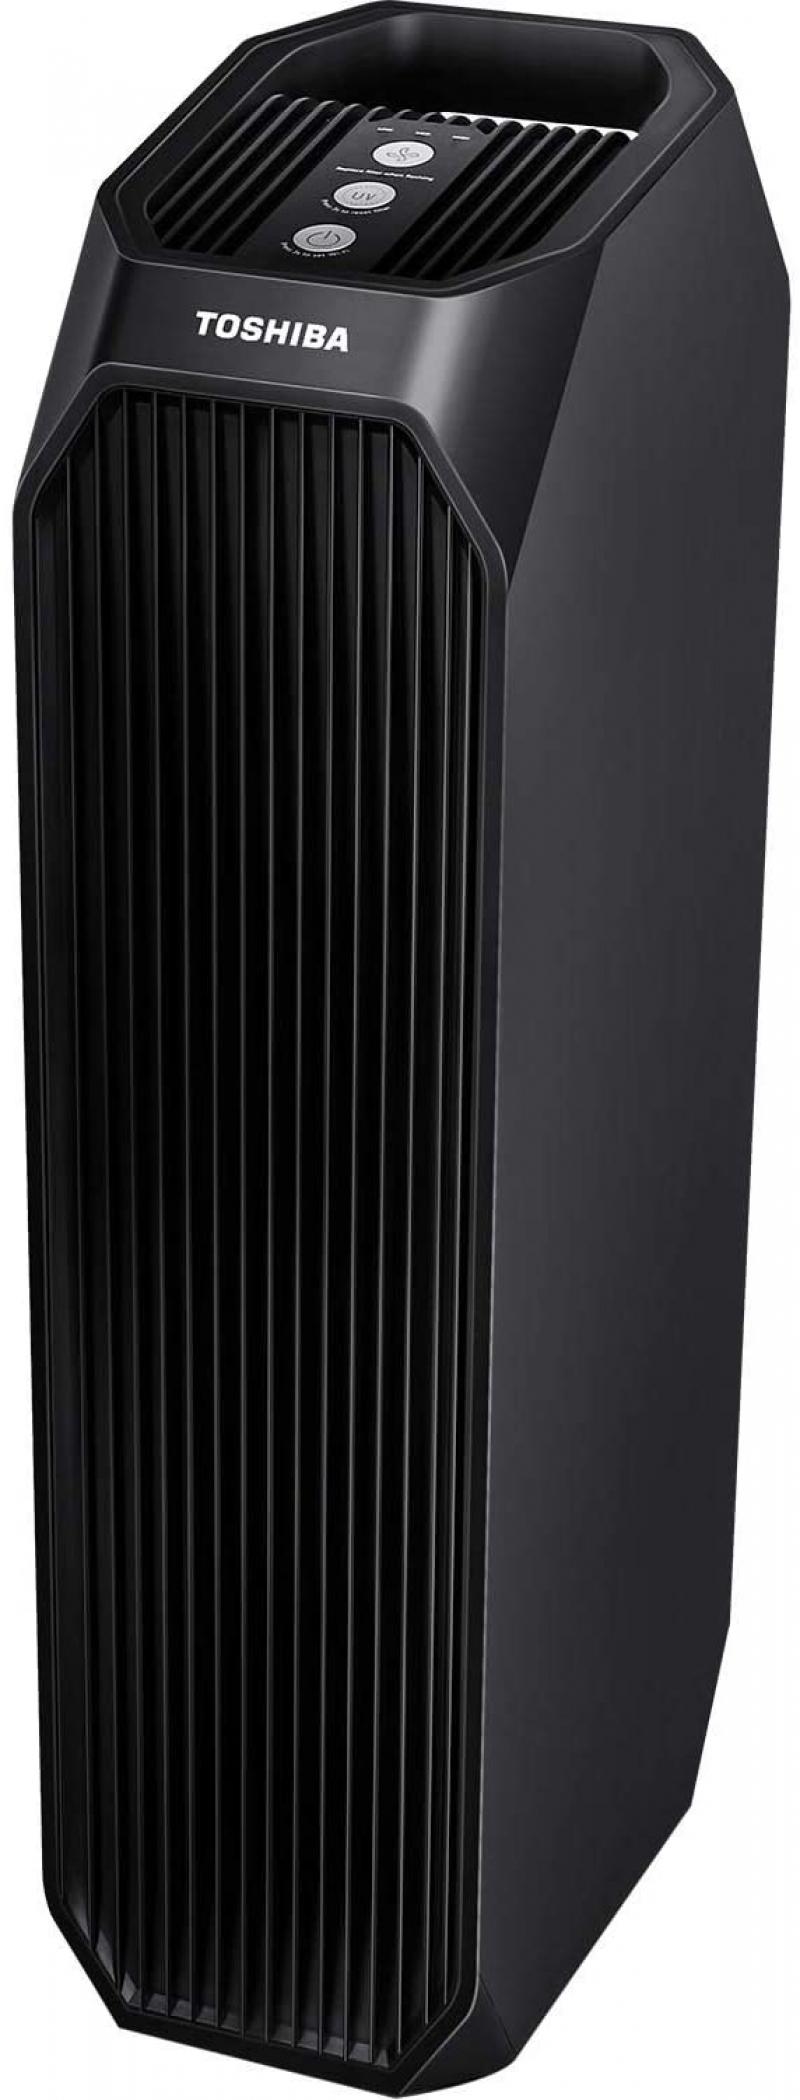 ihocon: Toshiba Feature Smart WiFi Purifier, True HEPA Air Cleaner 空氣清淨機 / 空氣淨化器